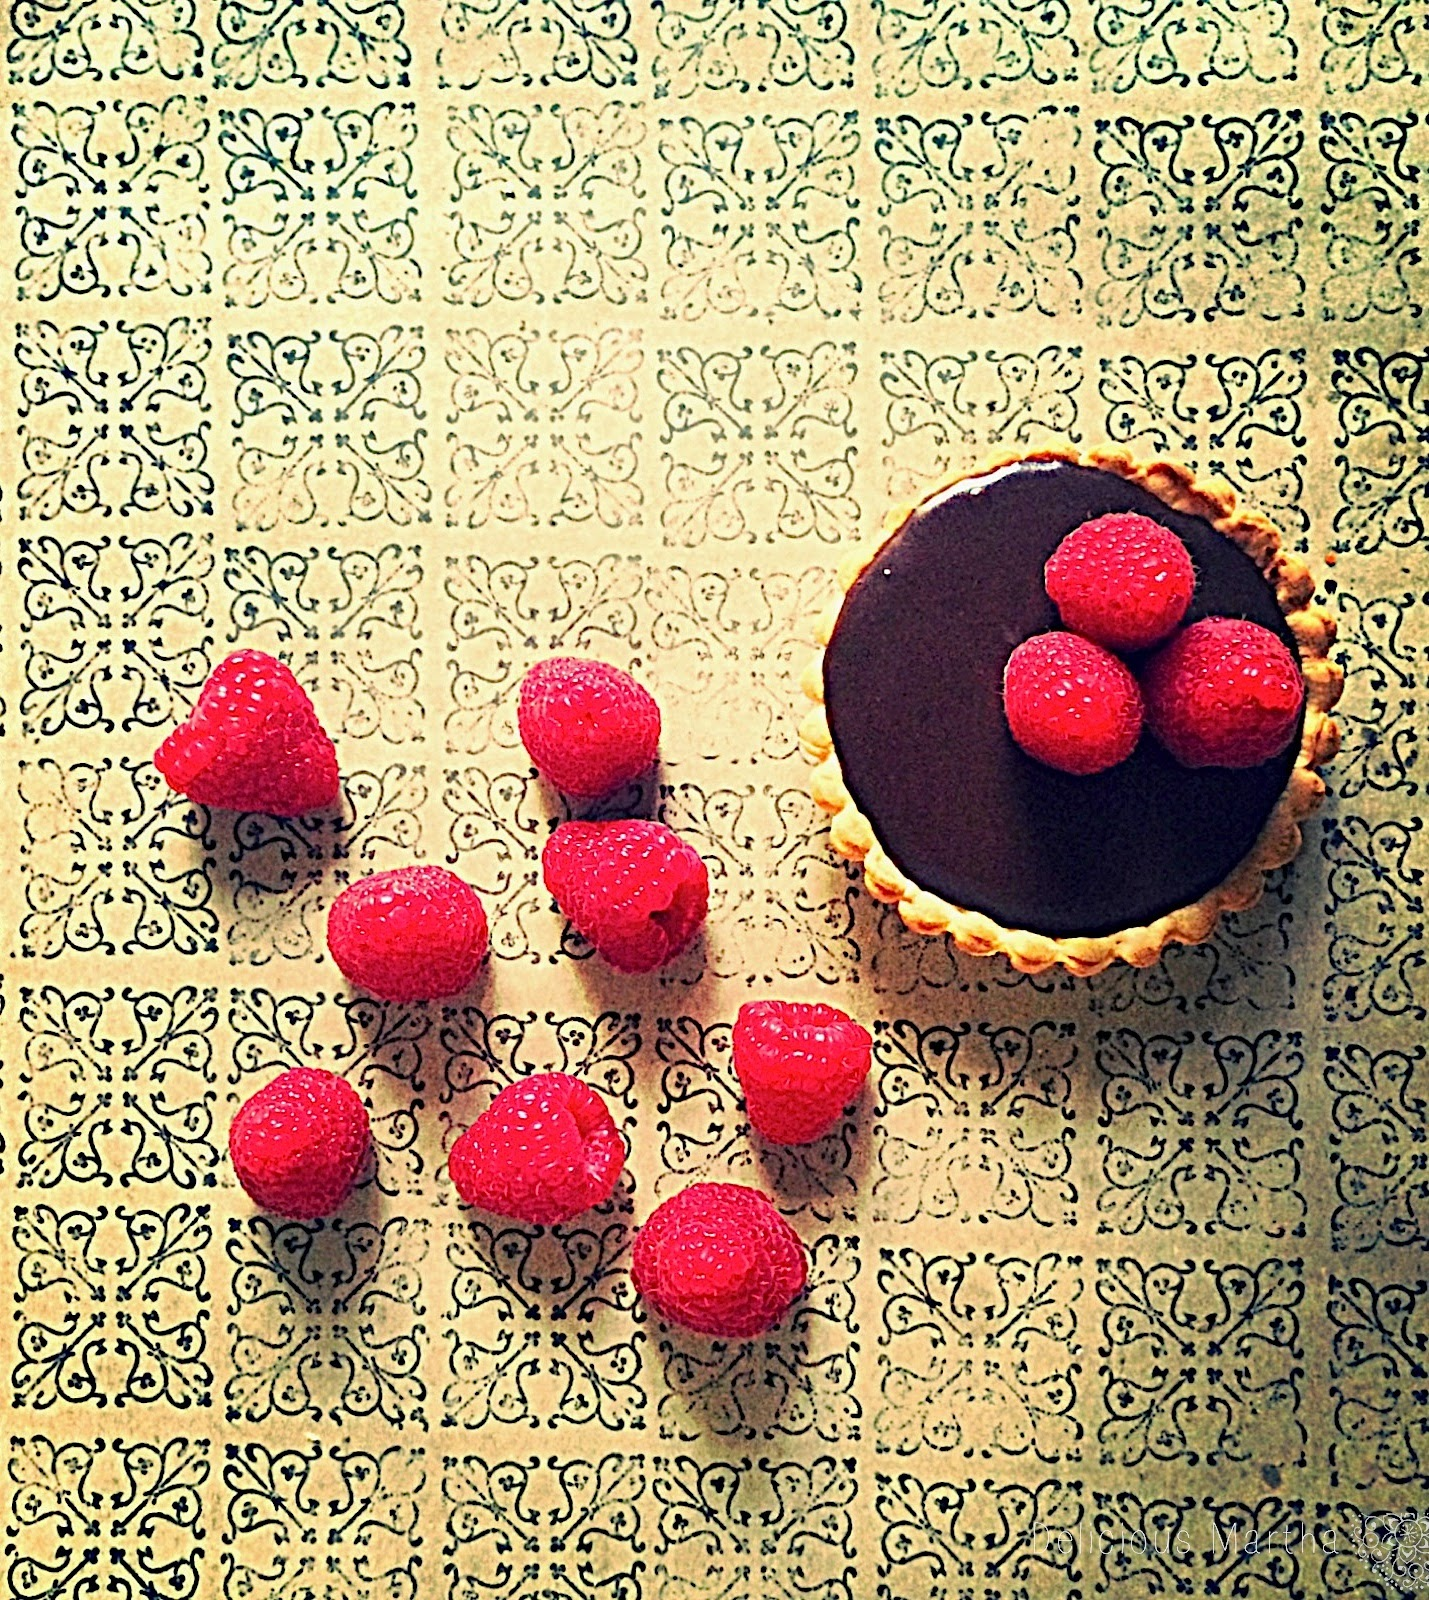 Tartaletas de chocolate con mermelada de frambuesa y cacao Can Bech